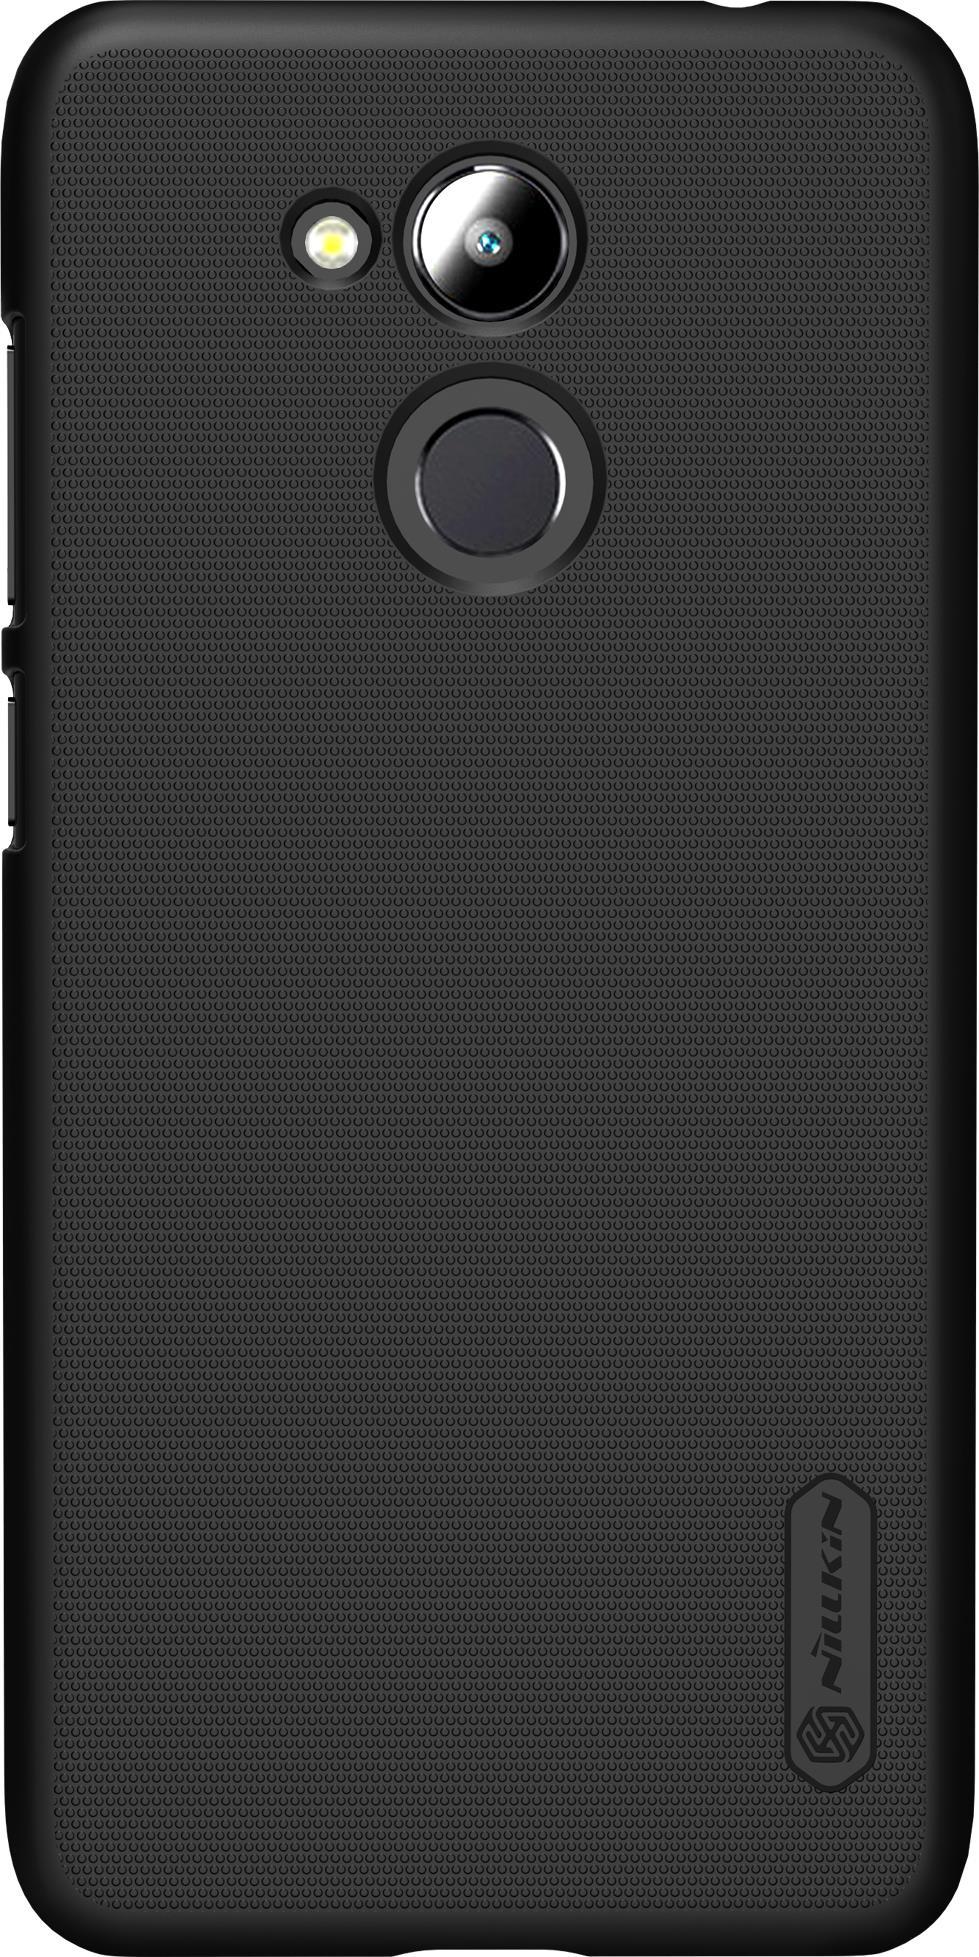 Чехол для Huawei Honor V9 Play/6C Pro чехол книжка vili для honor 6c pro black